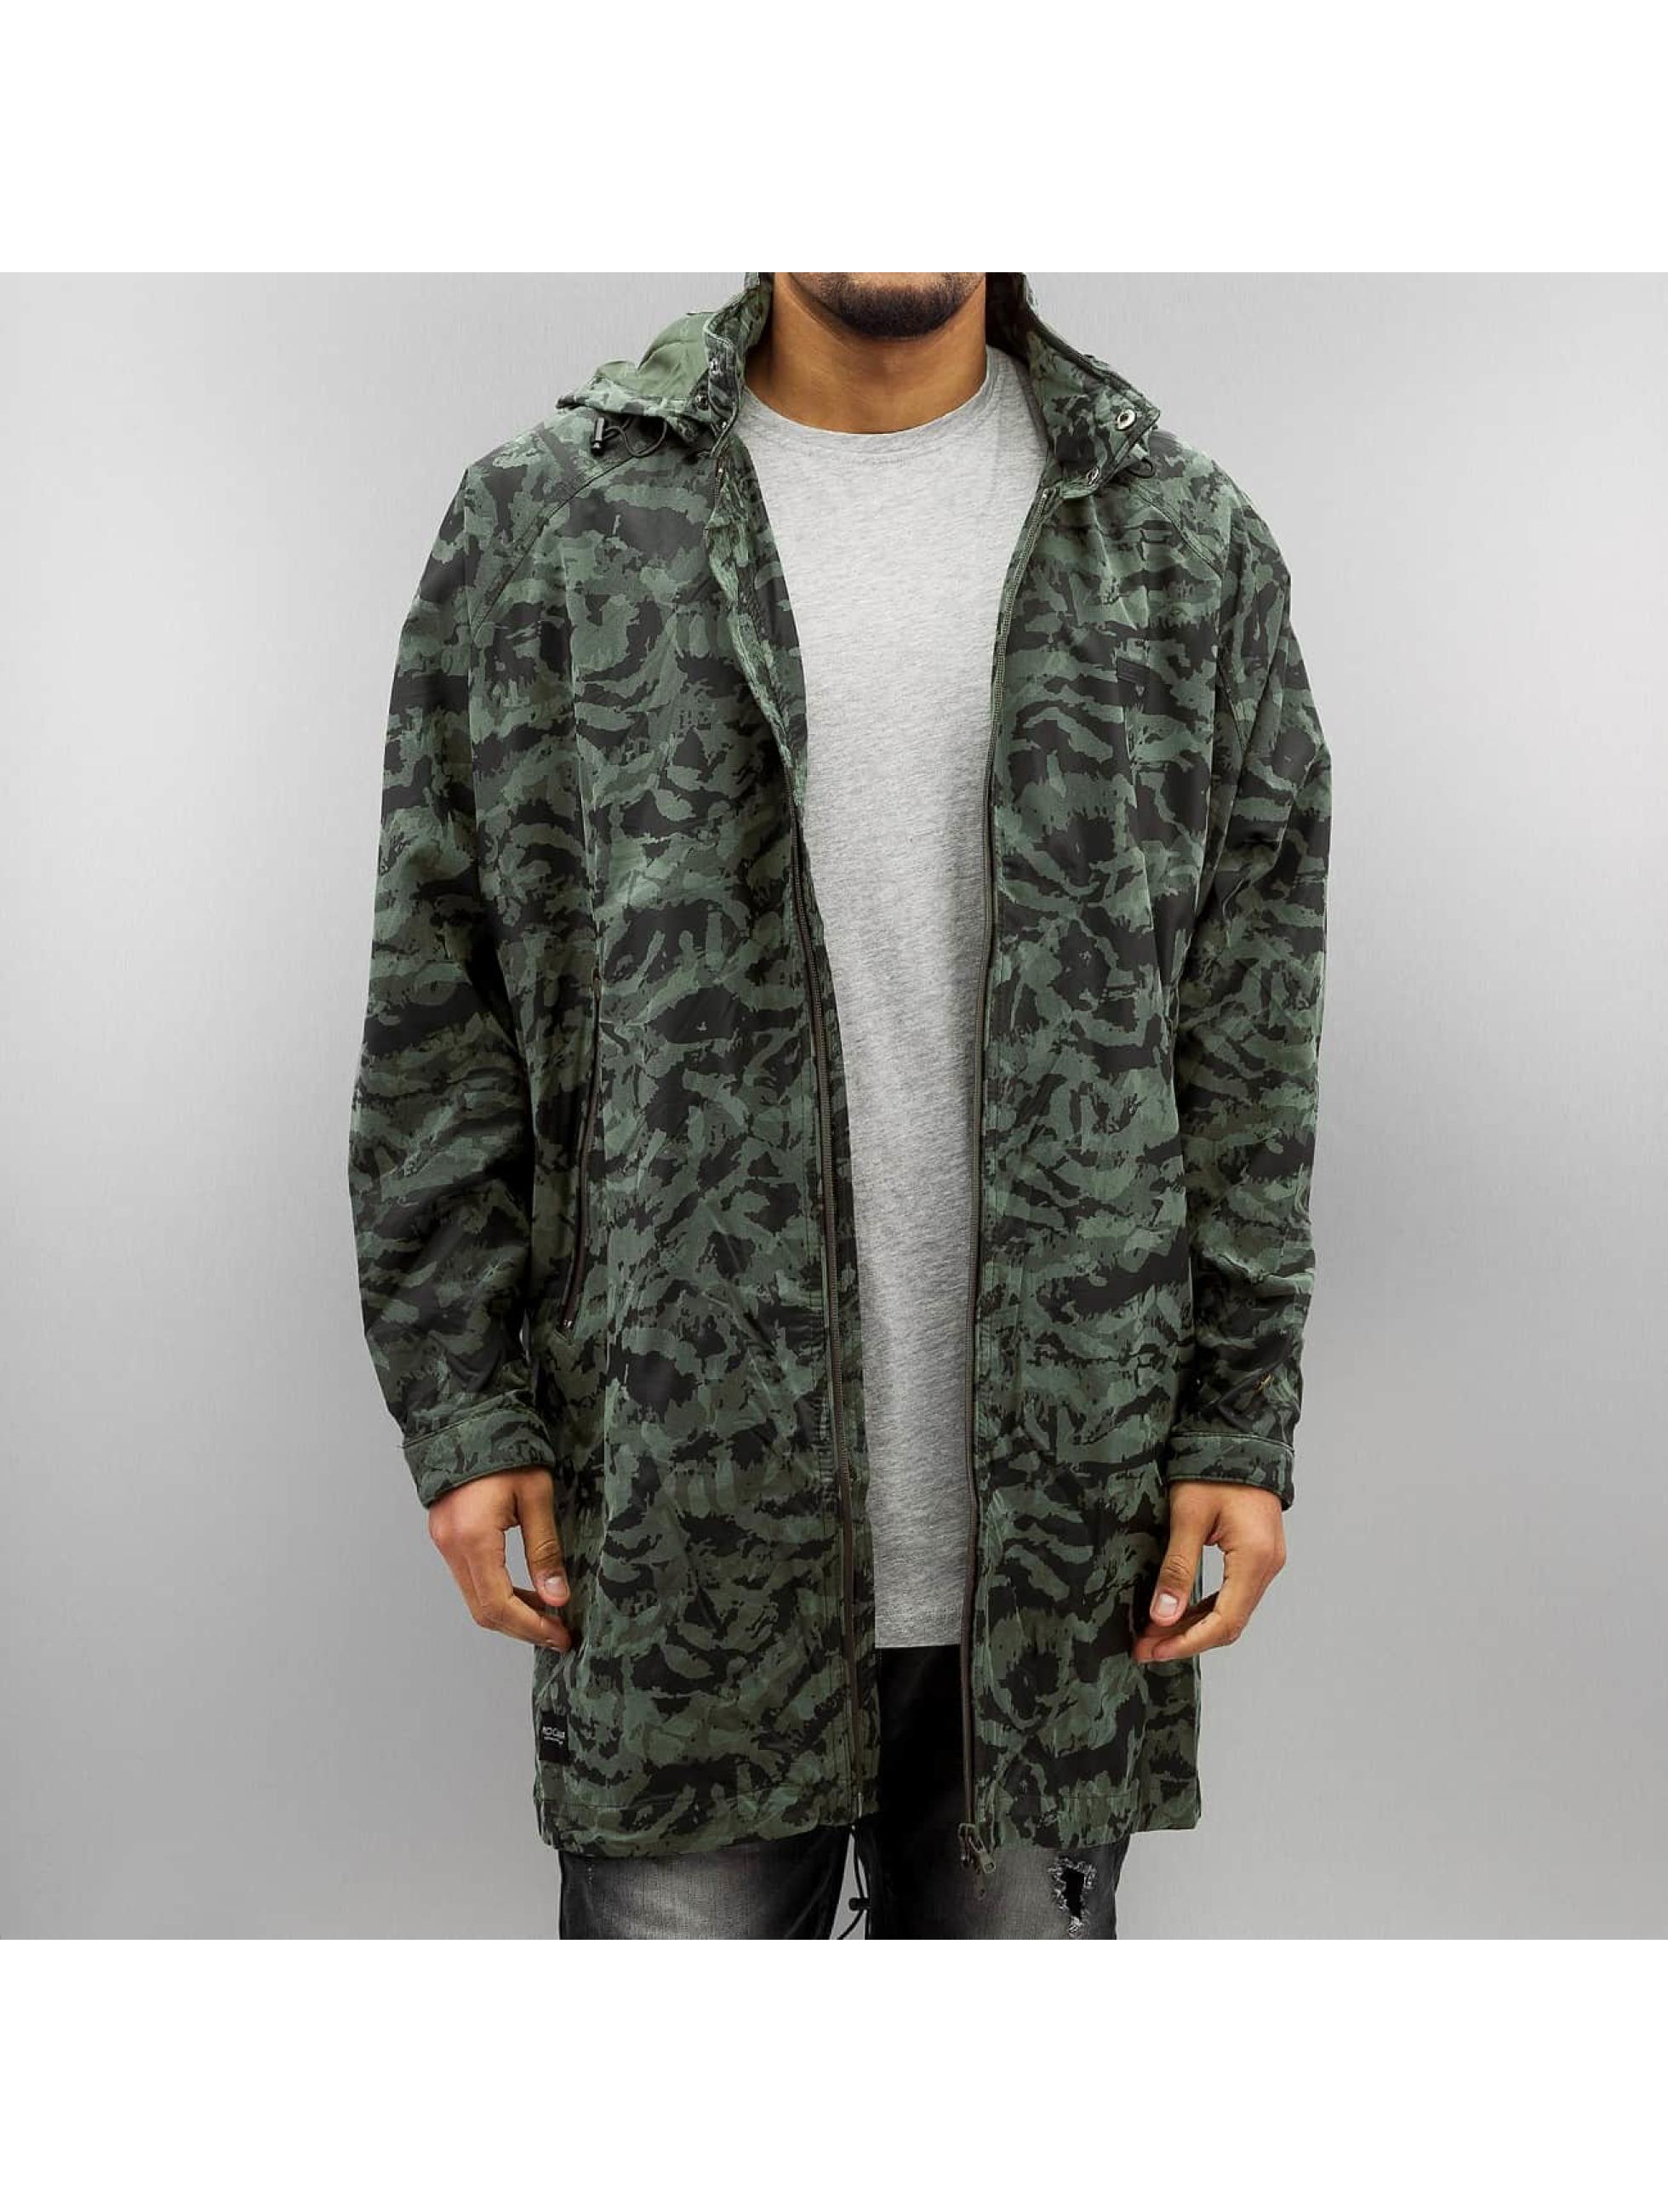 Rocawear / Winter Jacket Elmar in camouflage M